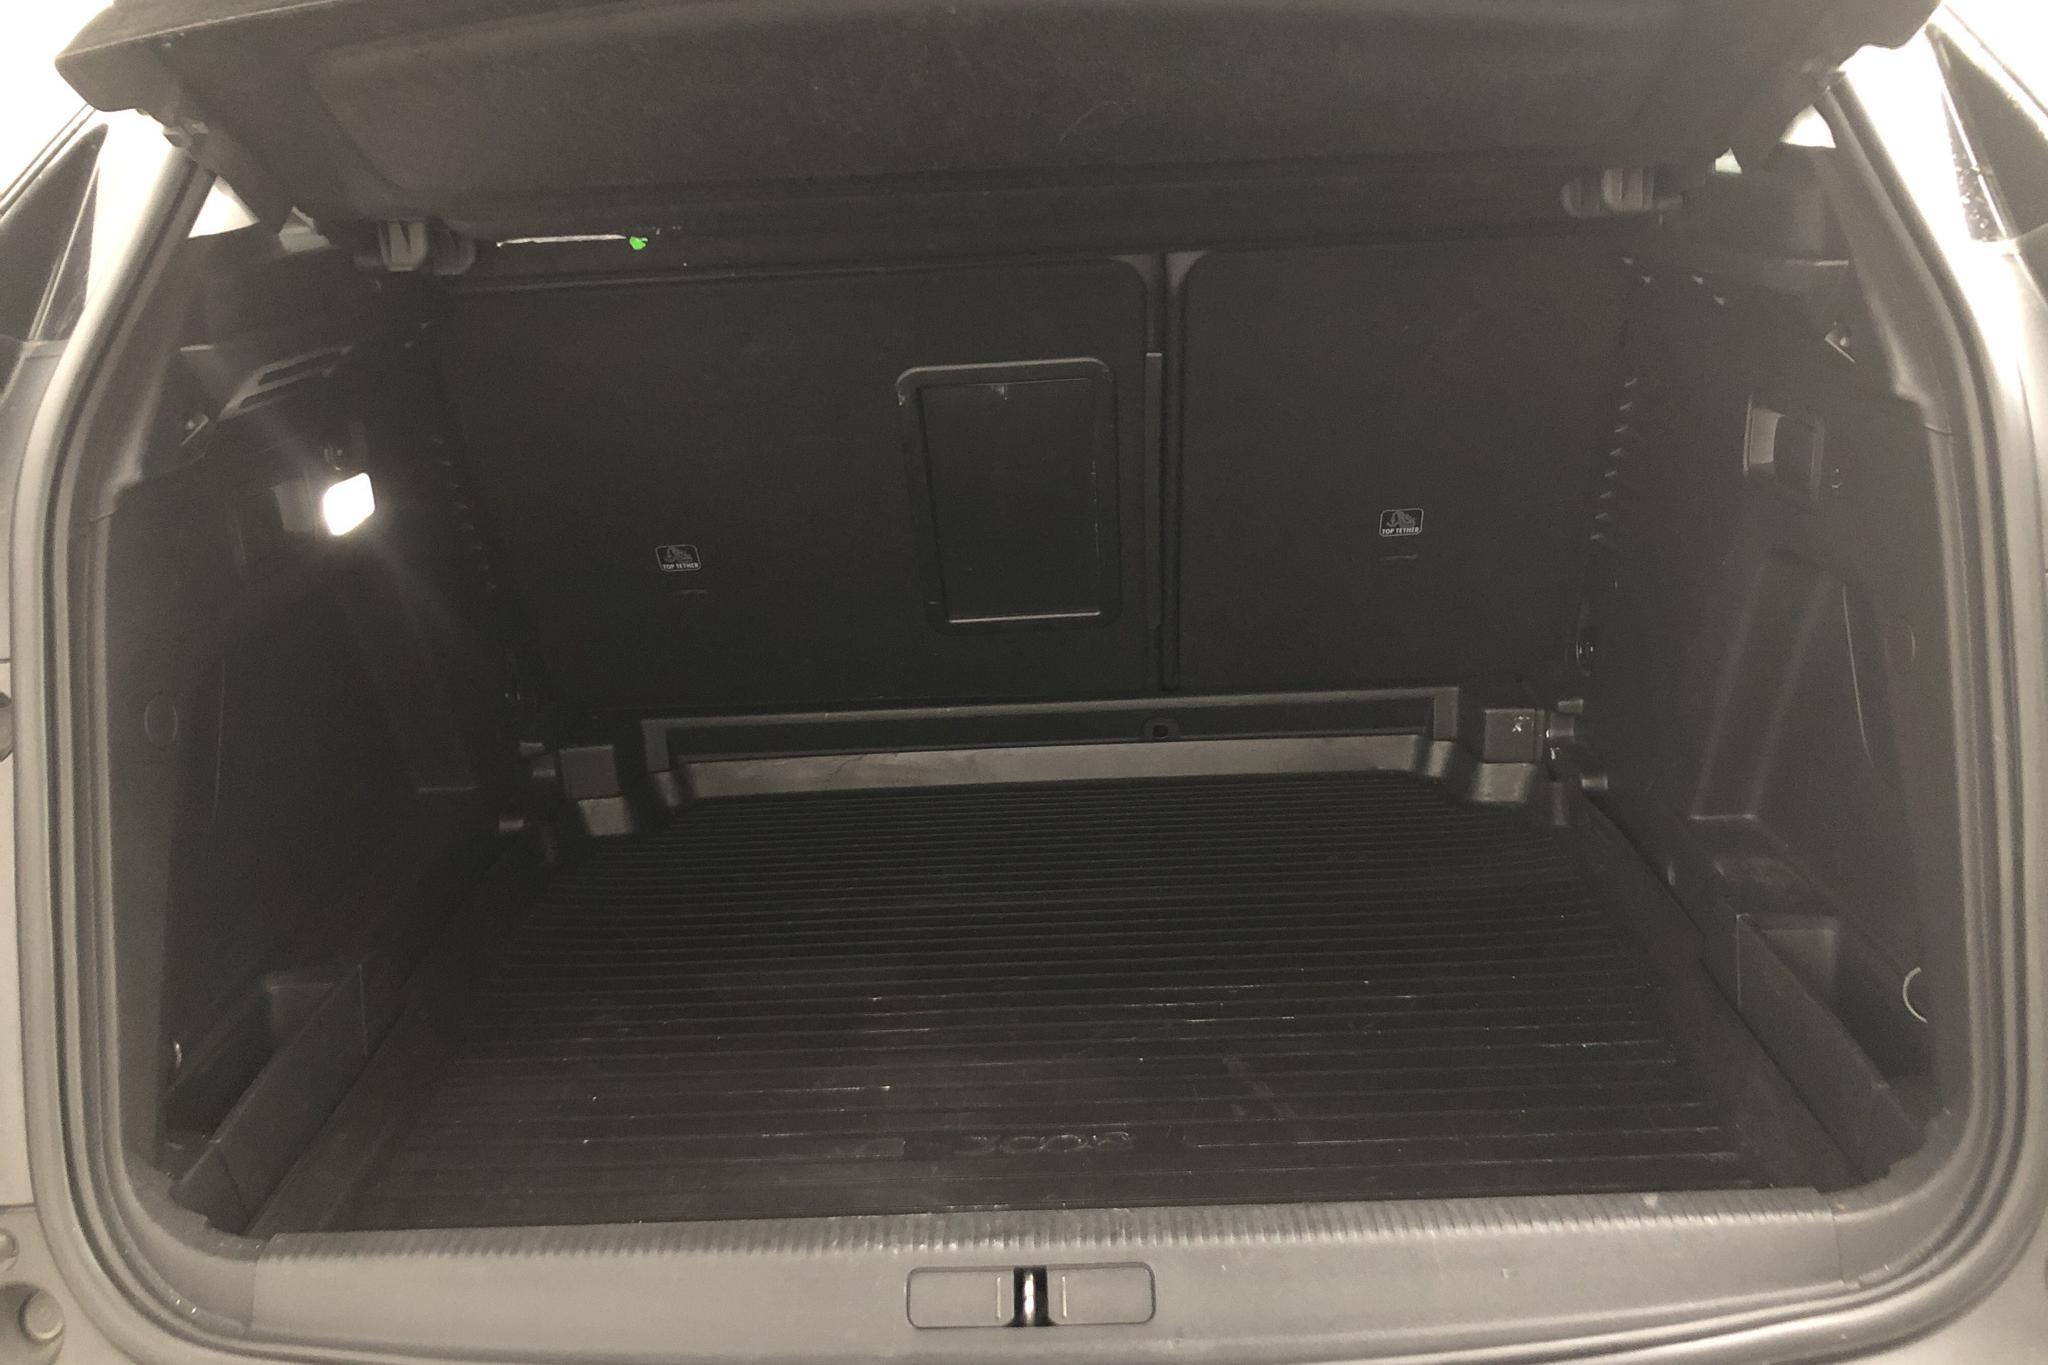 Peugeot 3008 1.6 BlueHDi (120hk) - 68 930 km - Automatic - 2017